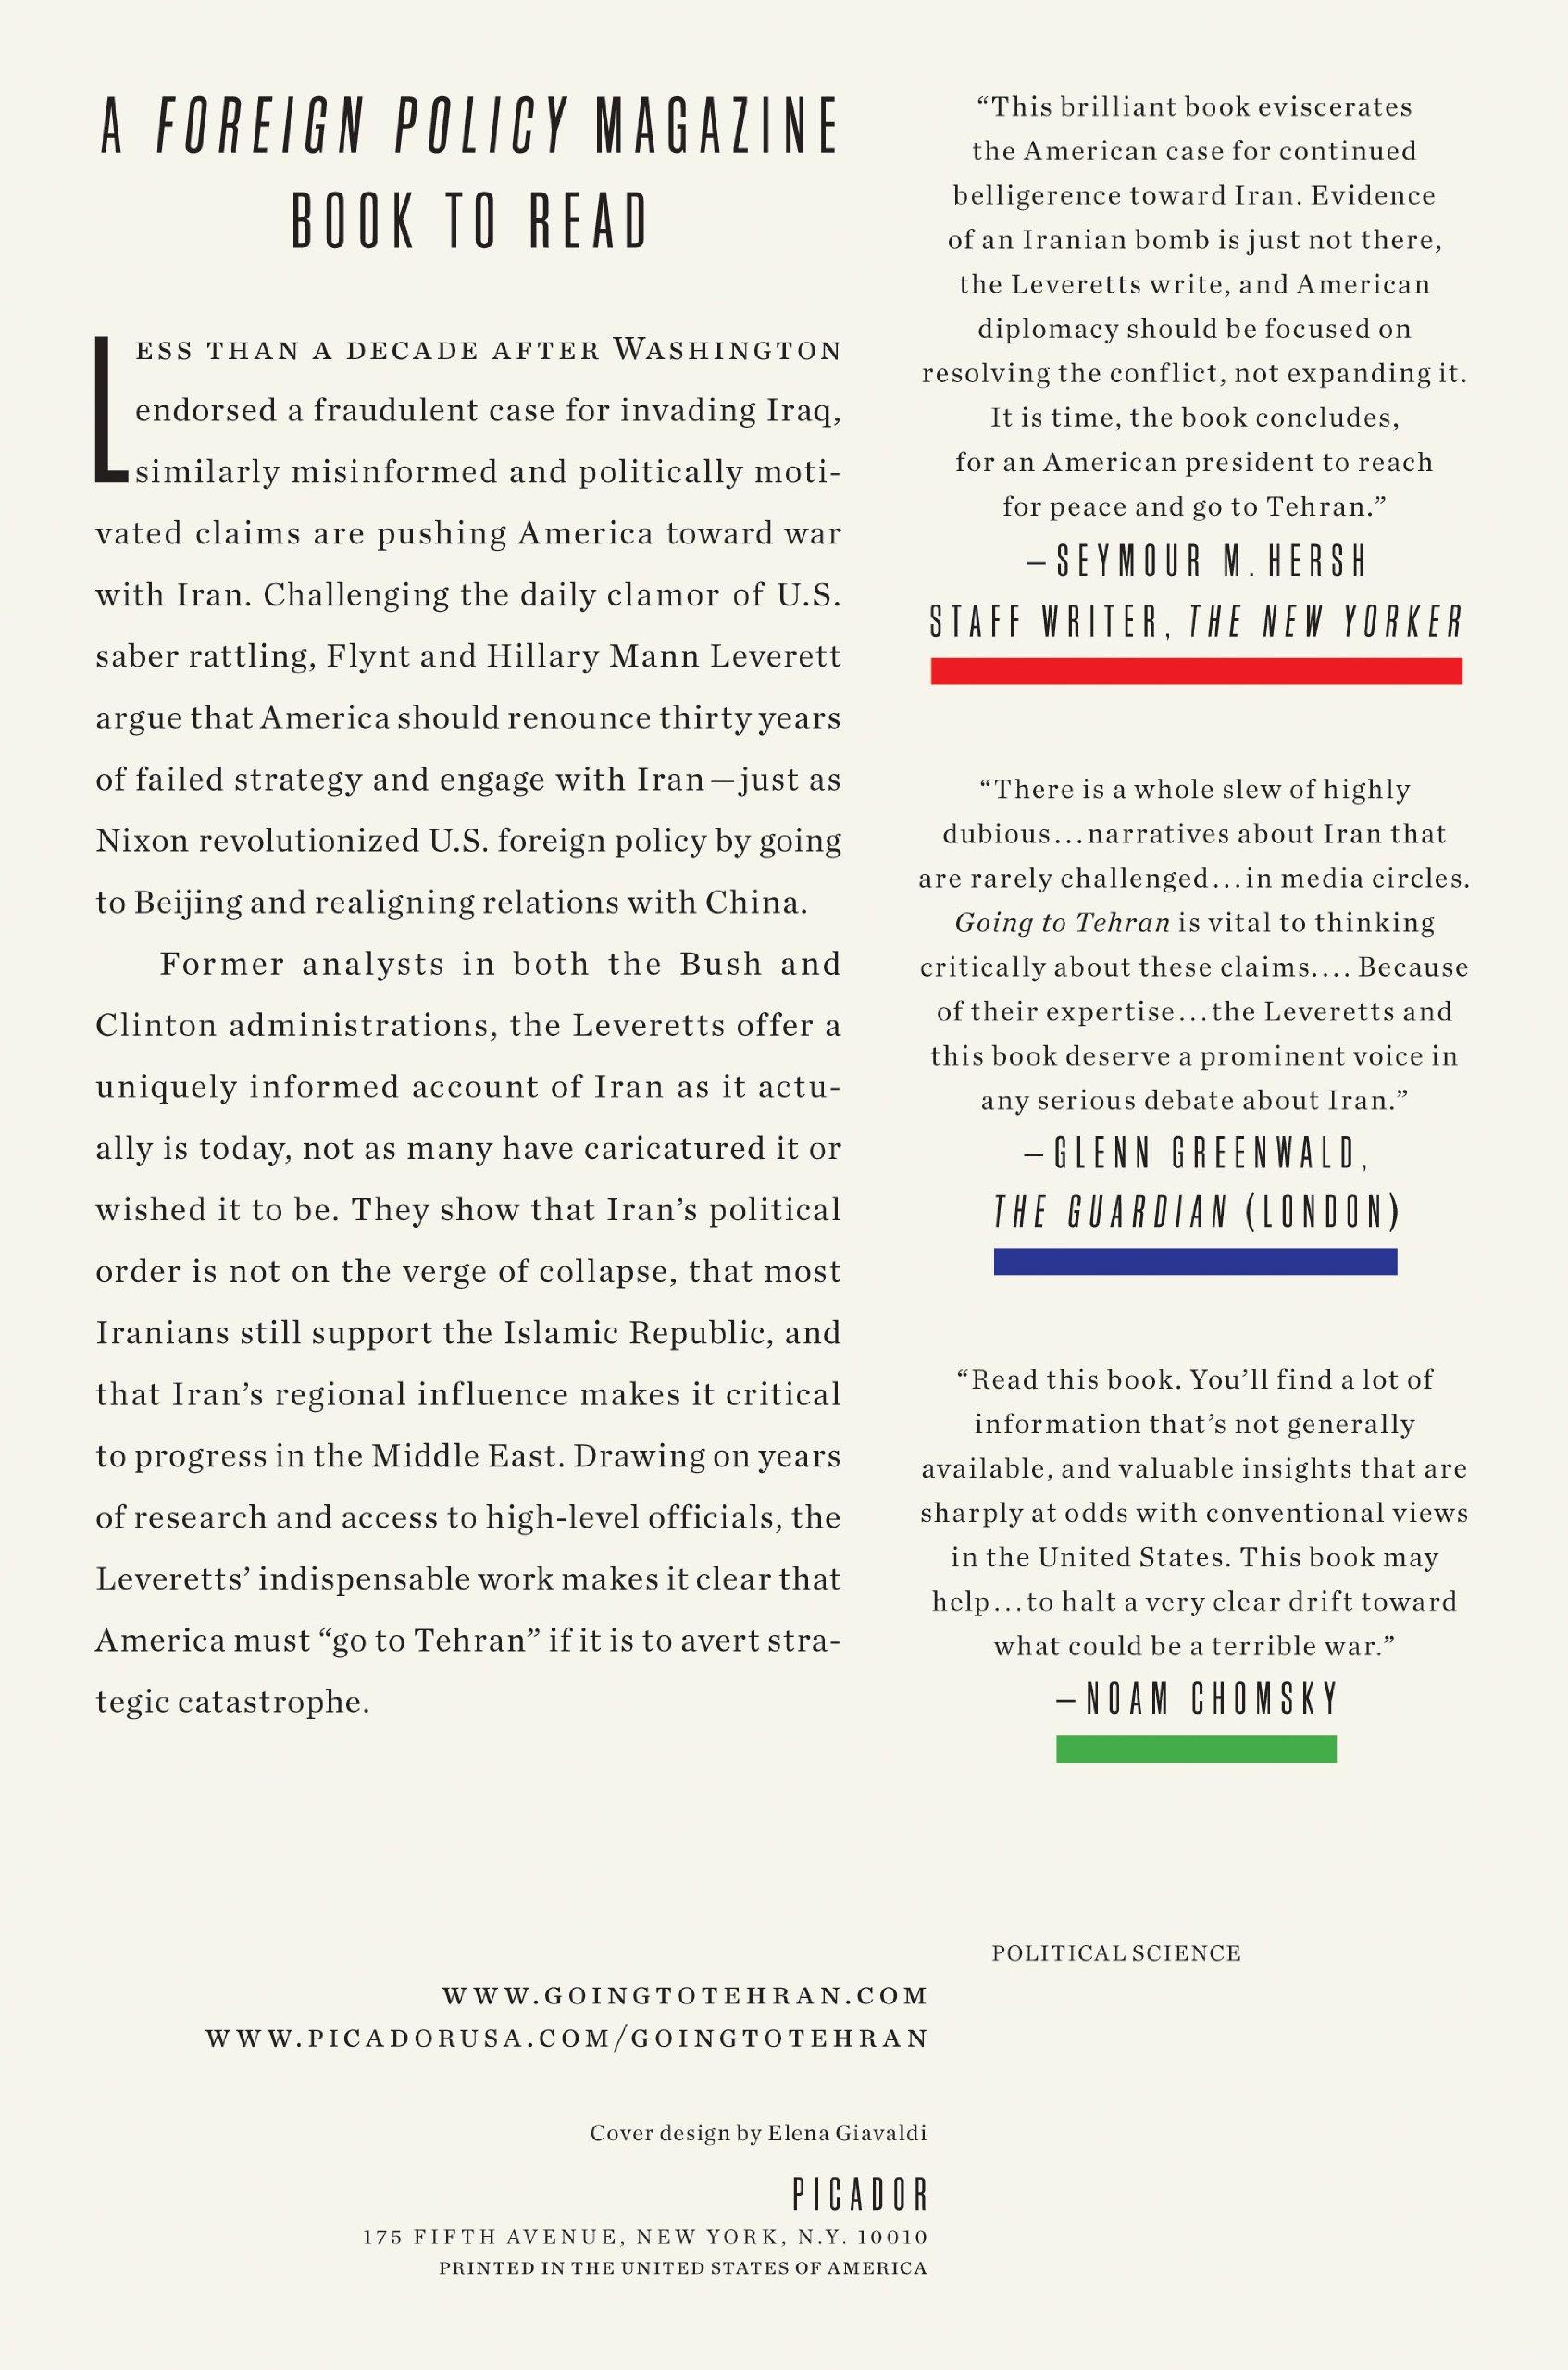 Going To Tehran: Why America Must Accept The Islamic Republic Of Iran:  Flynt Leverett, Hillary Mann Leverett: 9781250043535: Amazon: Books